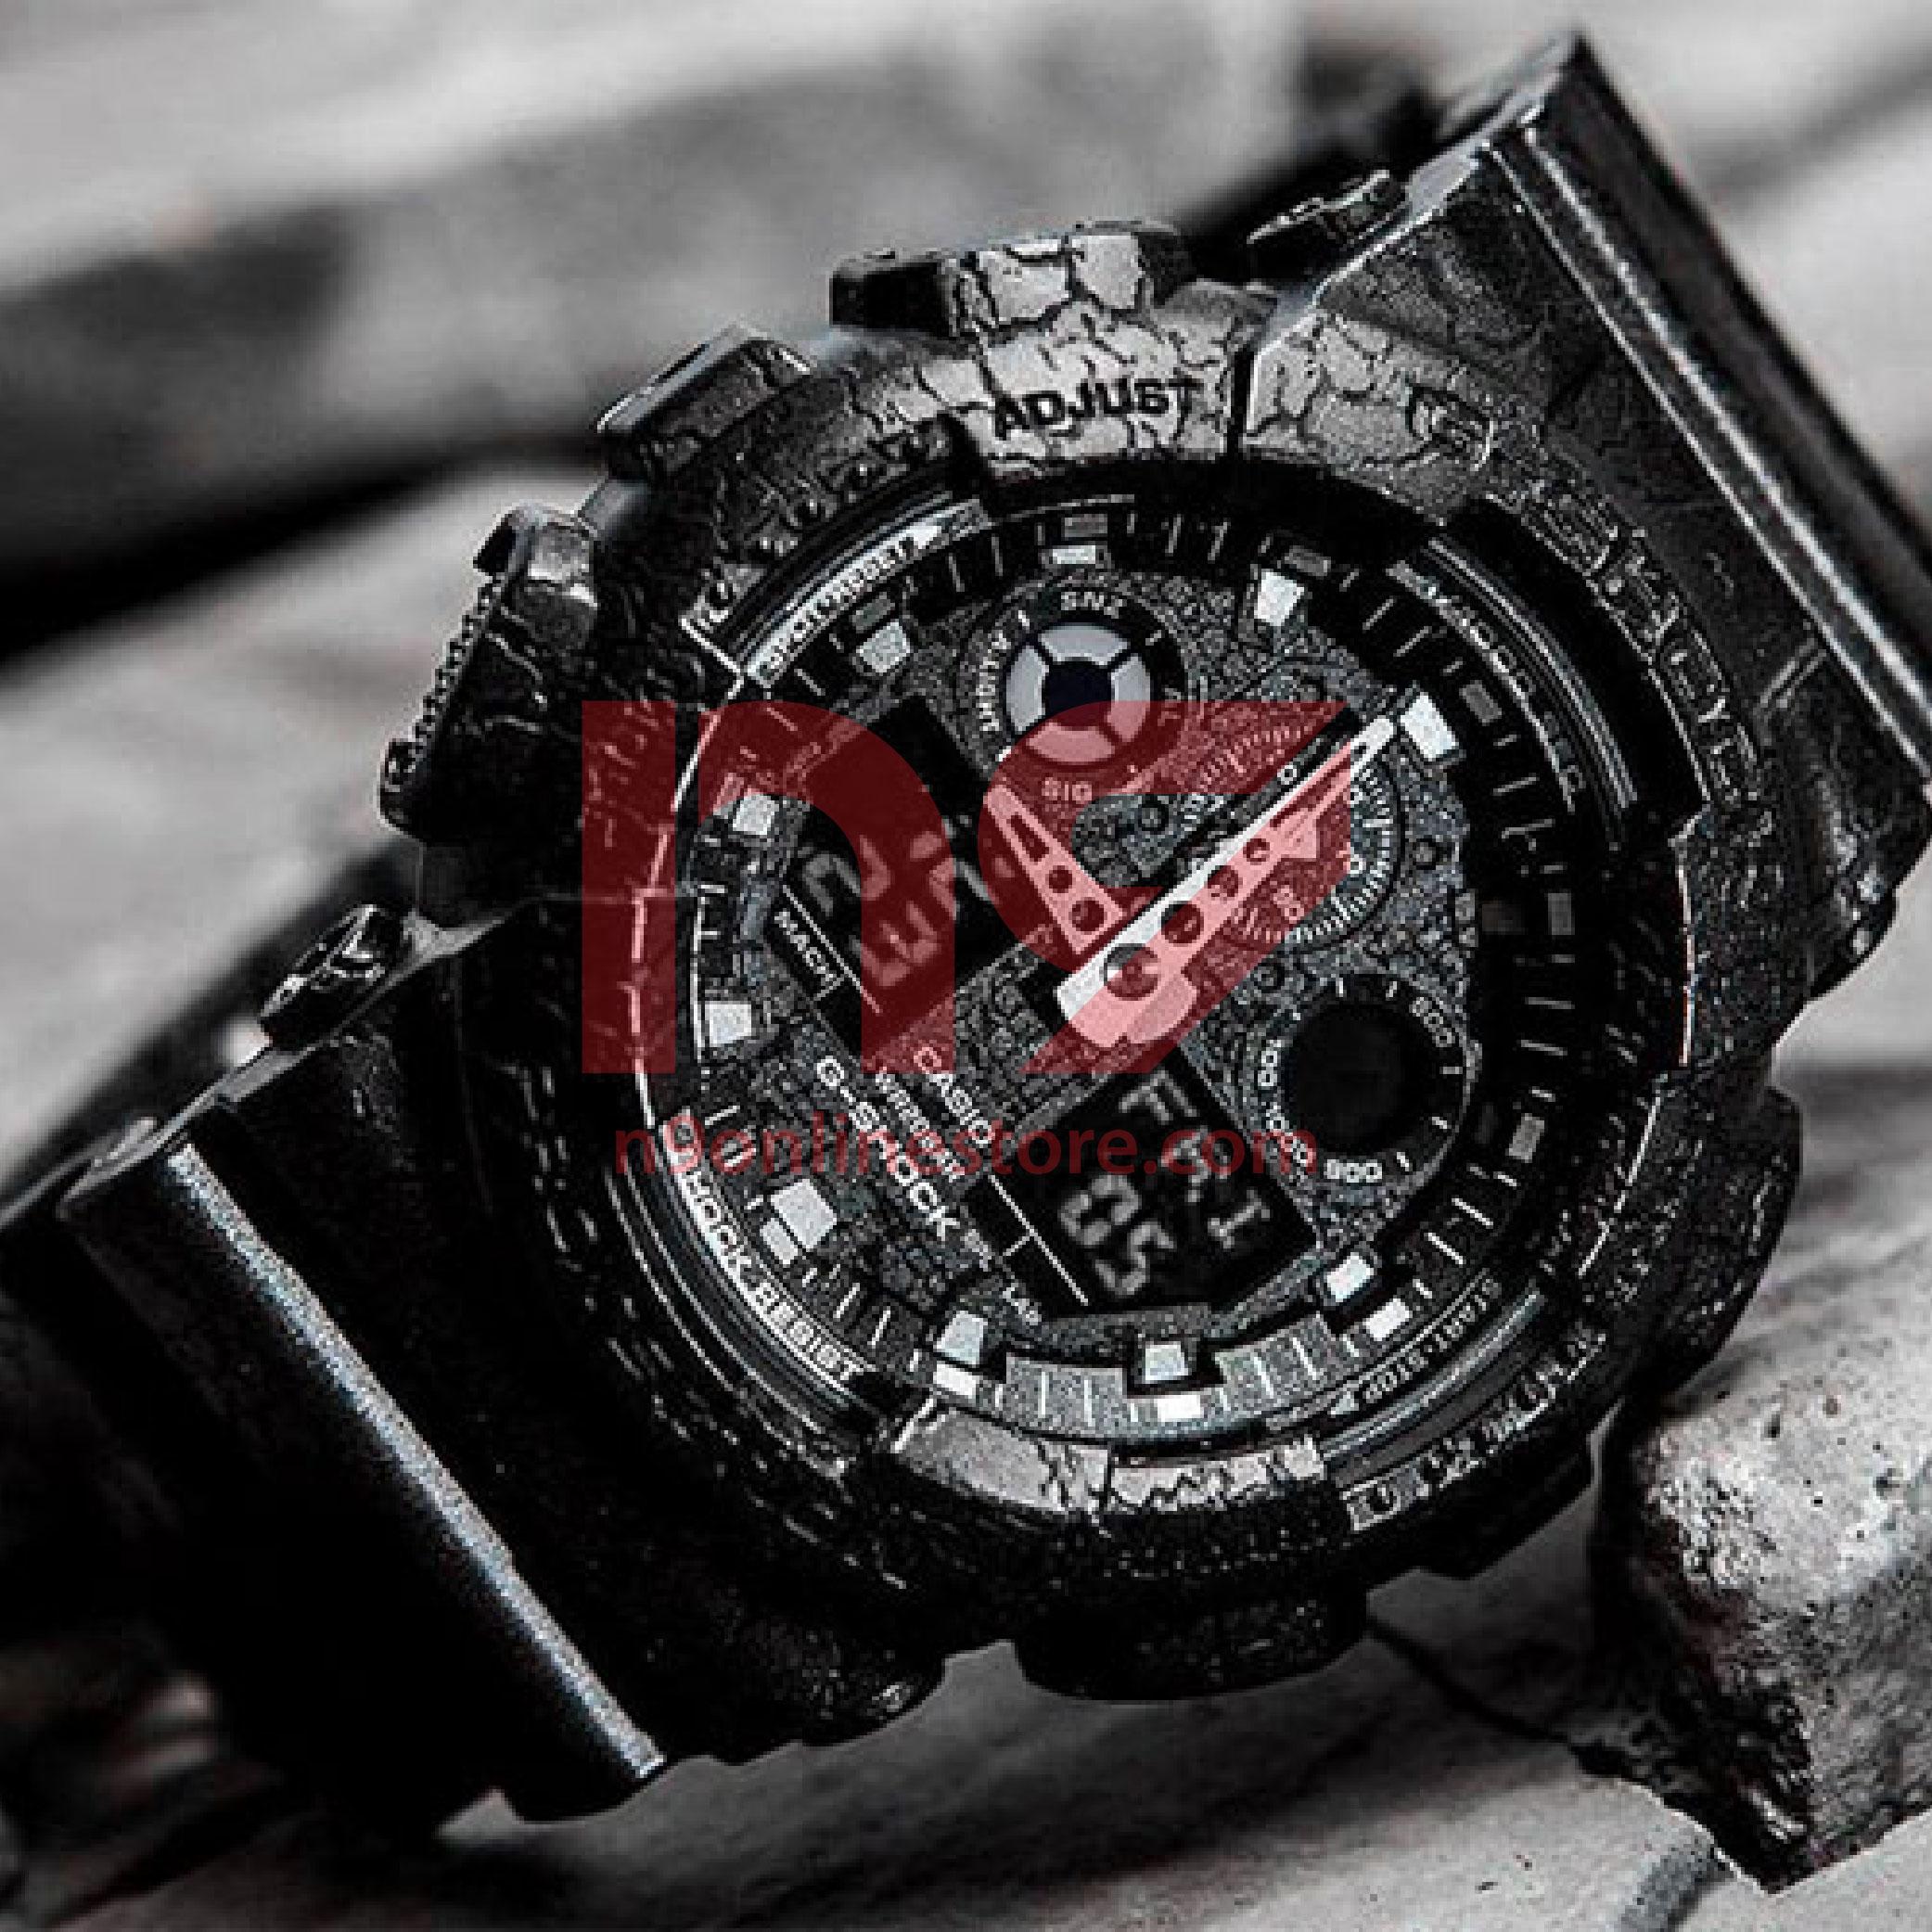 Casio G Shock Ga 100cg 1a Analog Digital Special Color Sports Watch